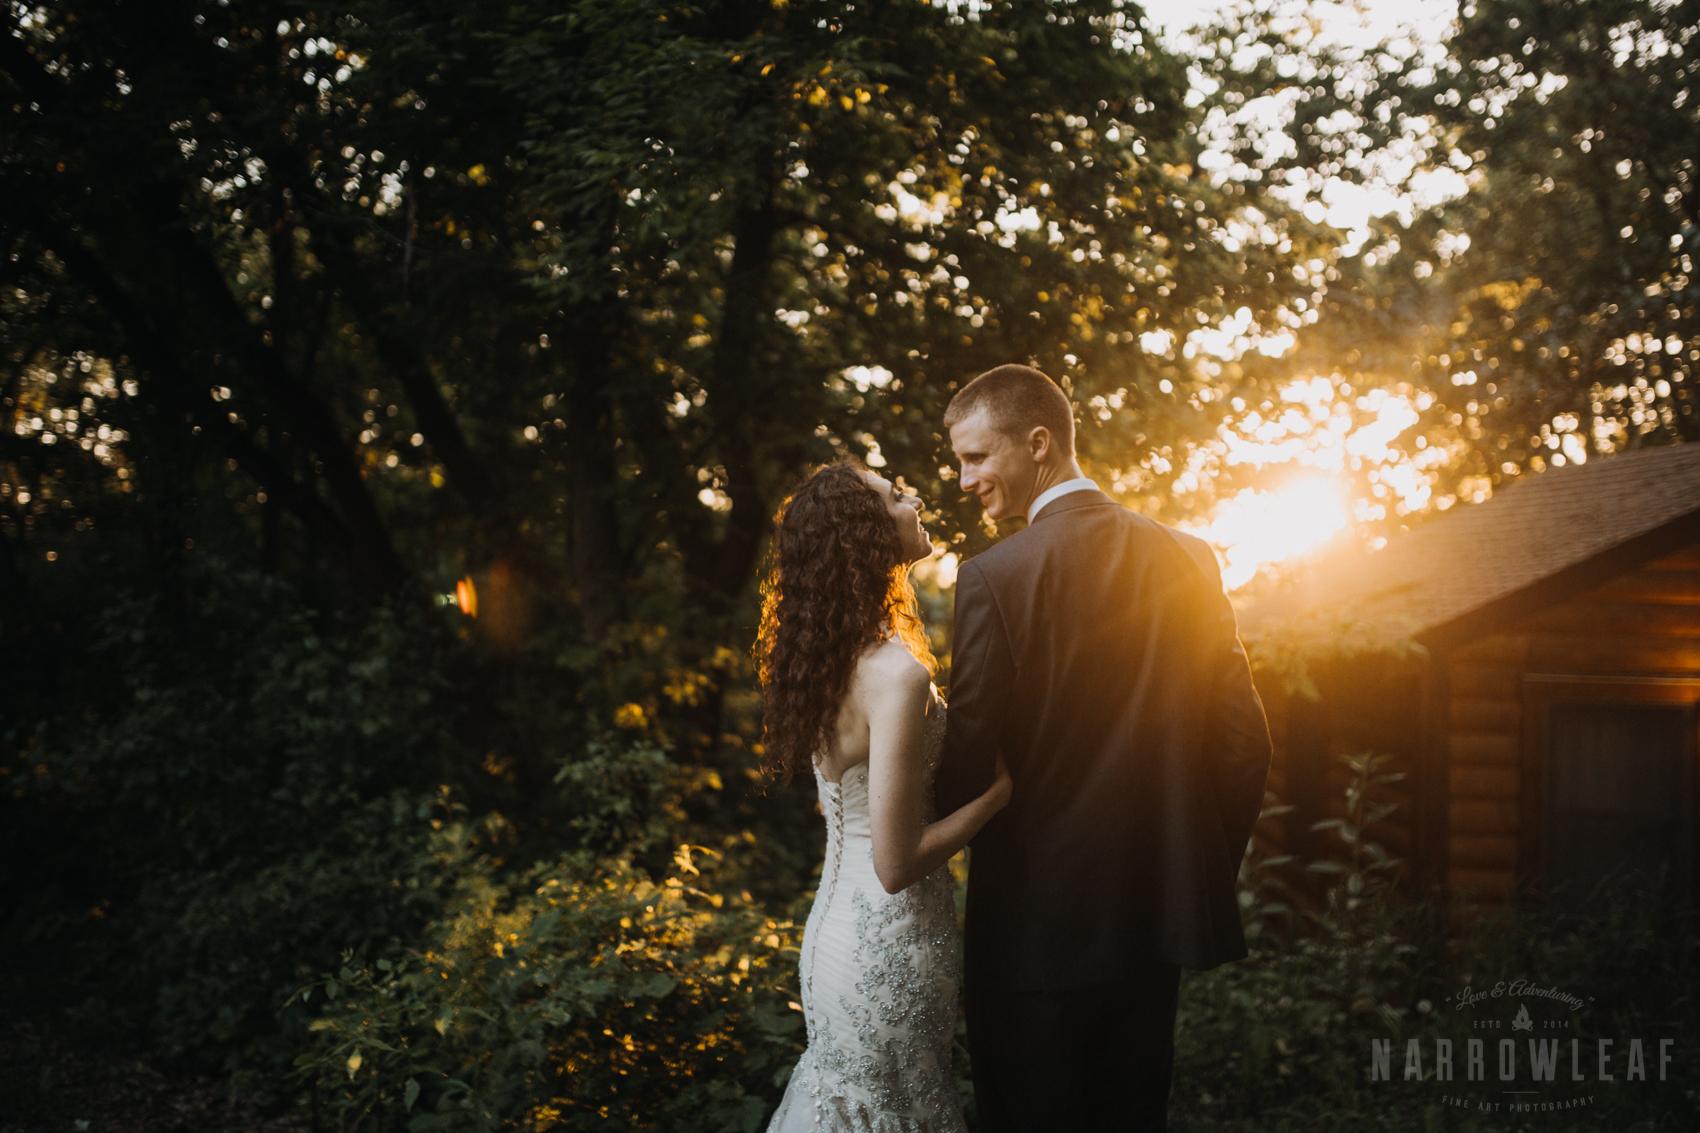 bride-mermaid-lace-wedding-gown-glitter-woods-sunset-300.jpg